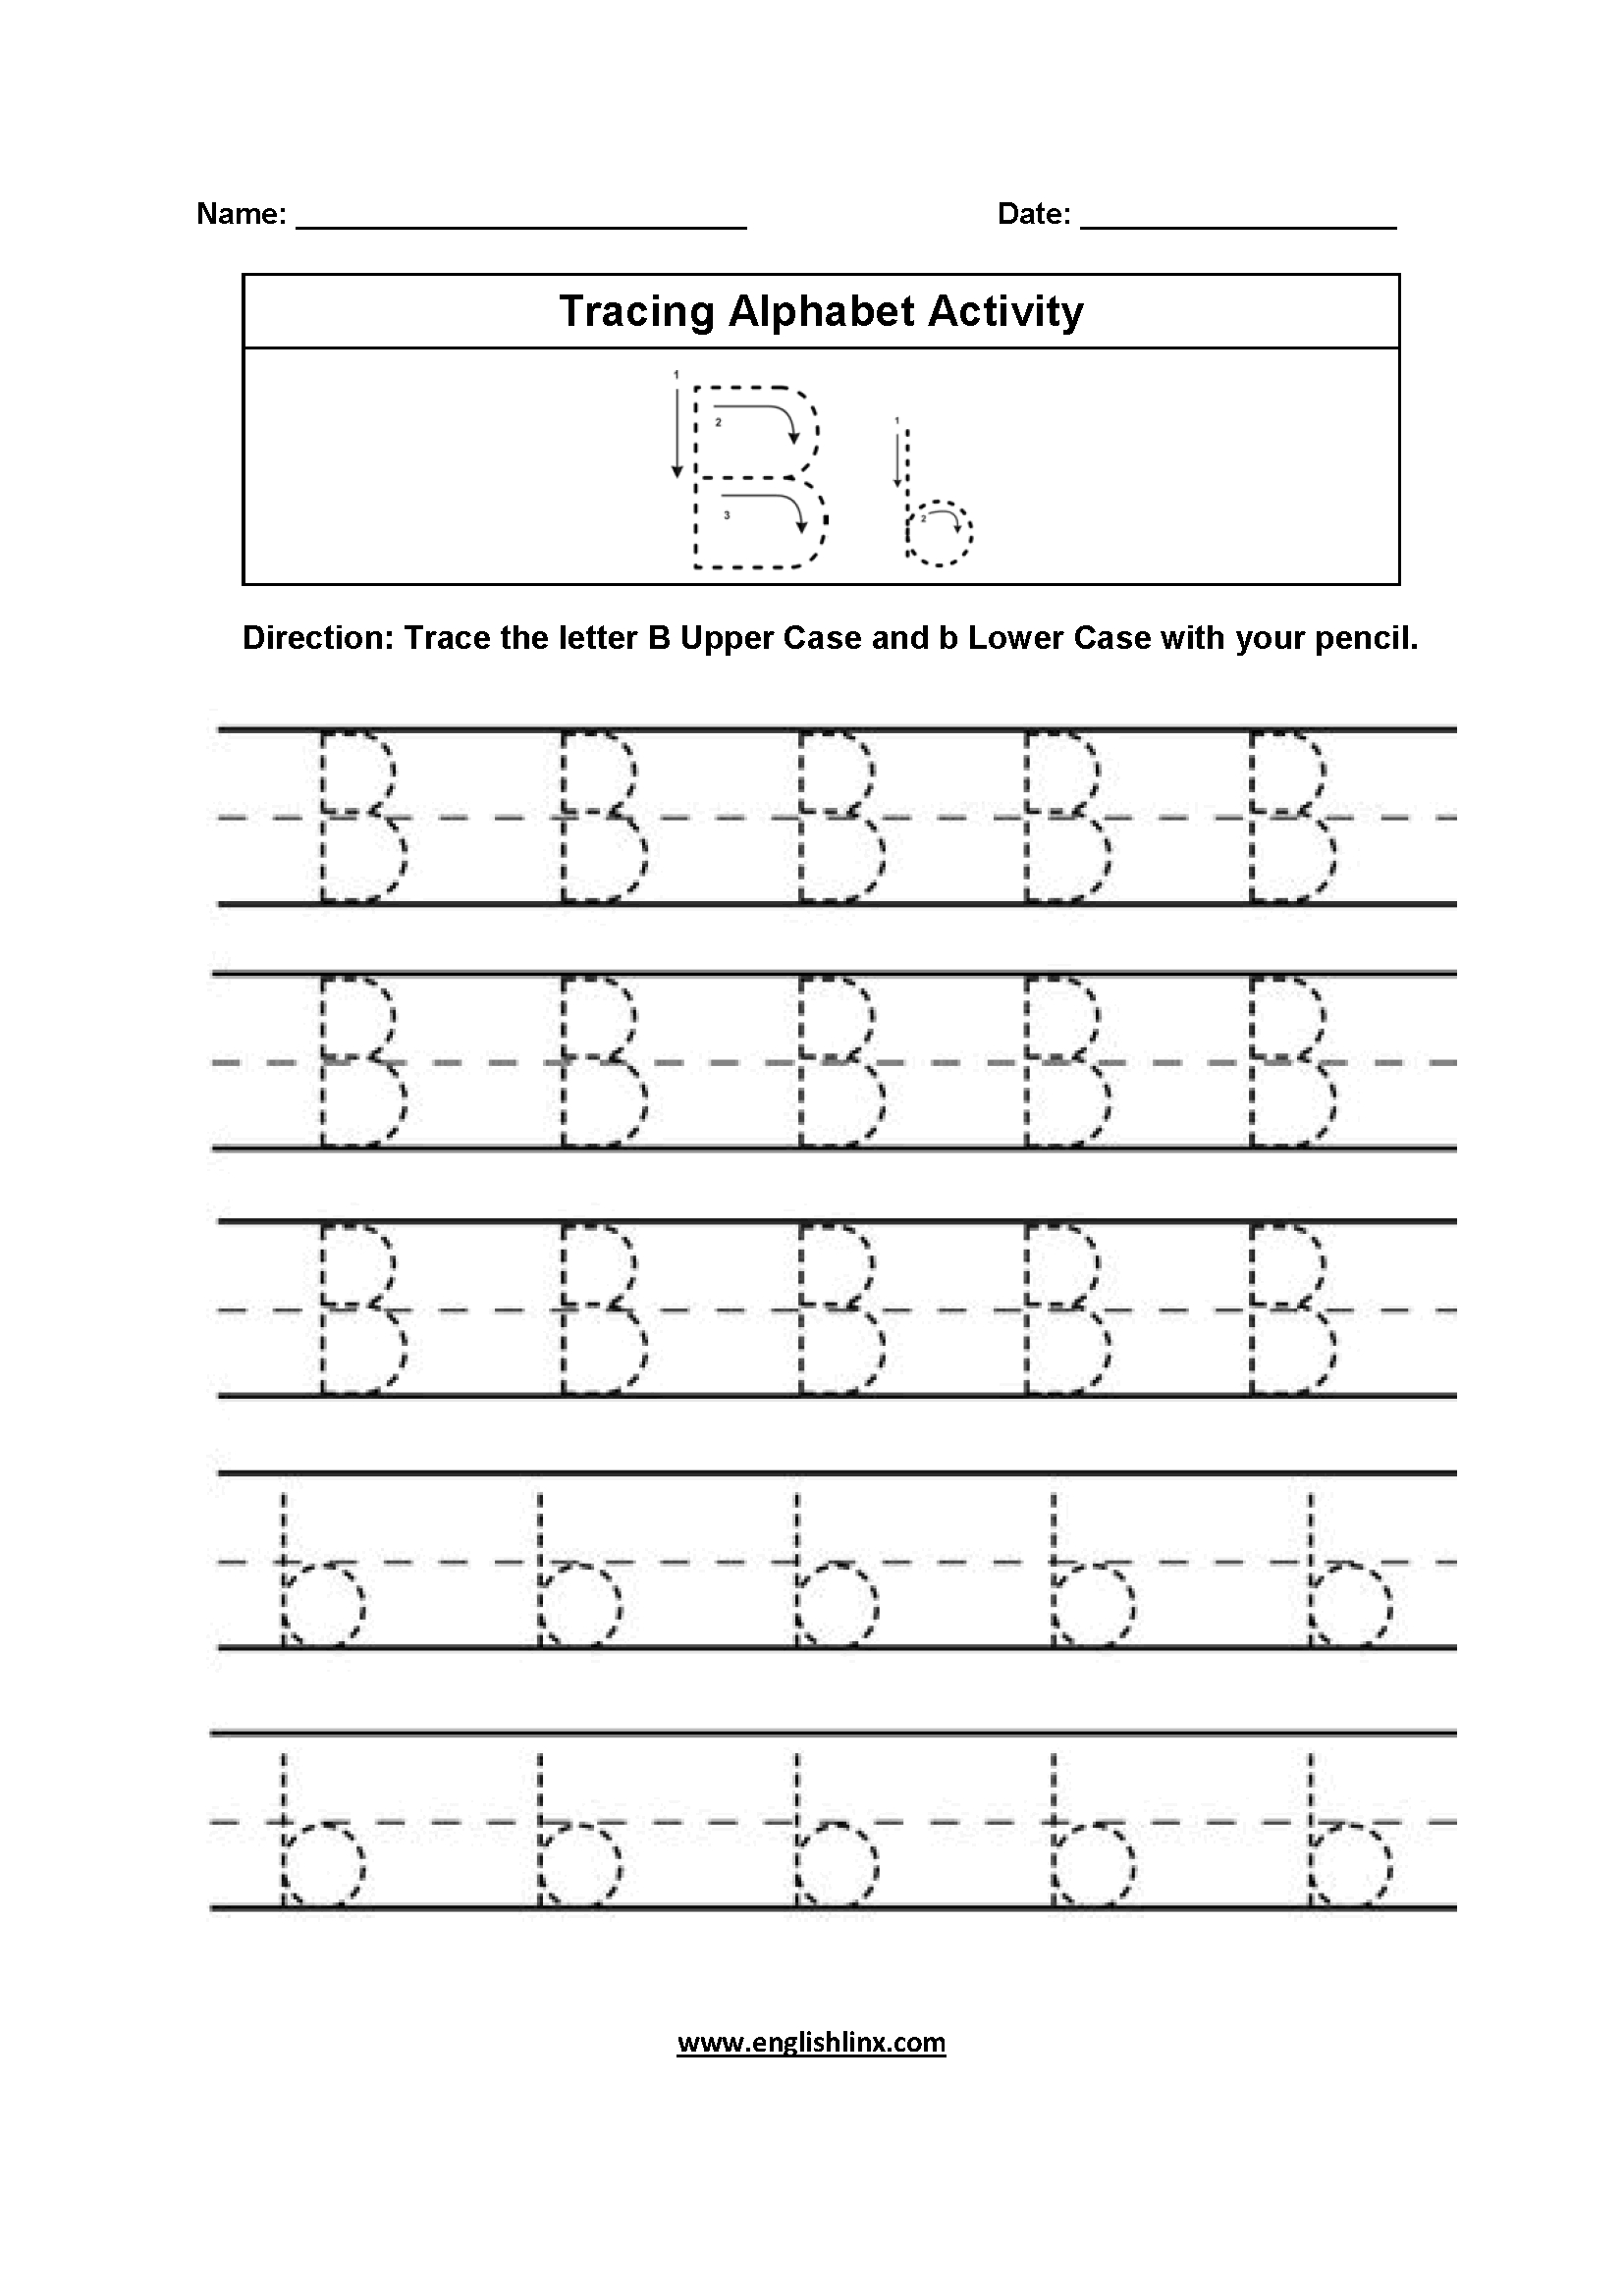 Letter B Tracing Alphabet Worksheets | Alphabet Worksheets inside Tracing Alphabet Letters Worksheets